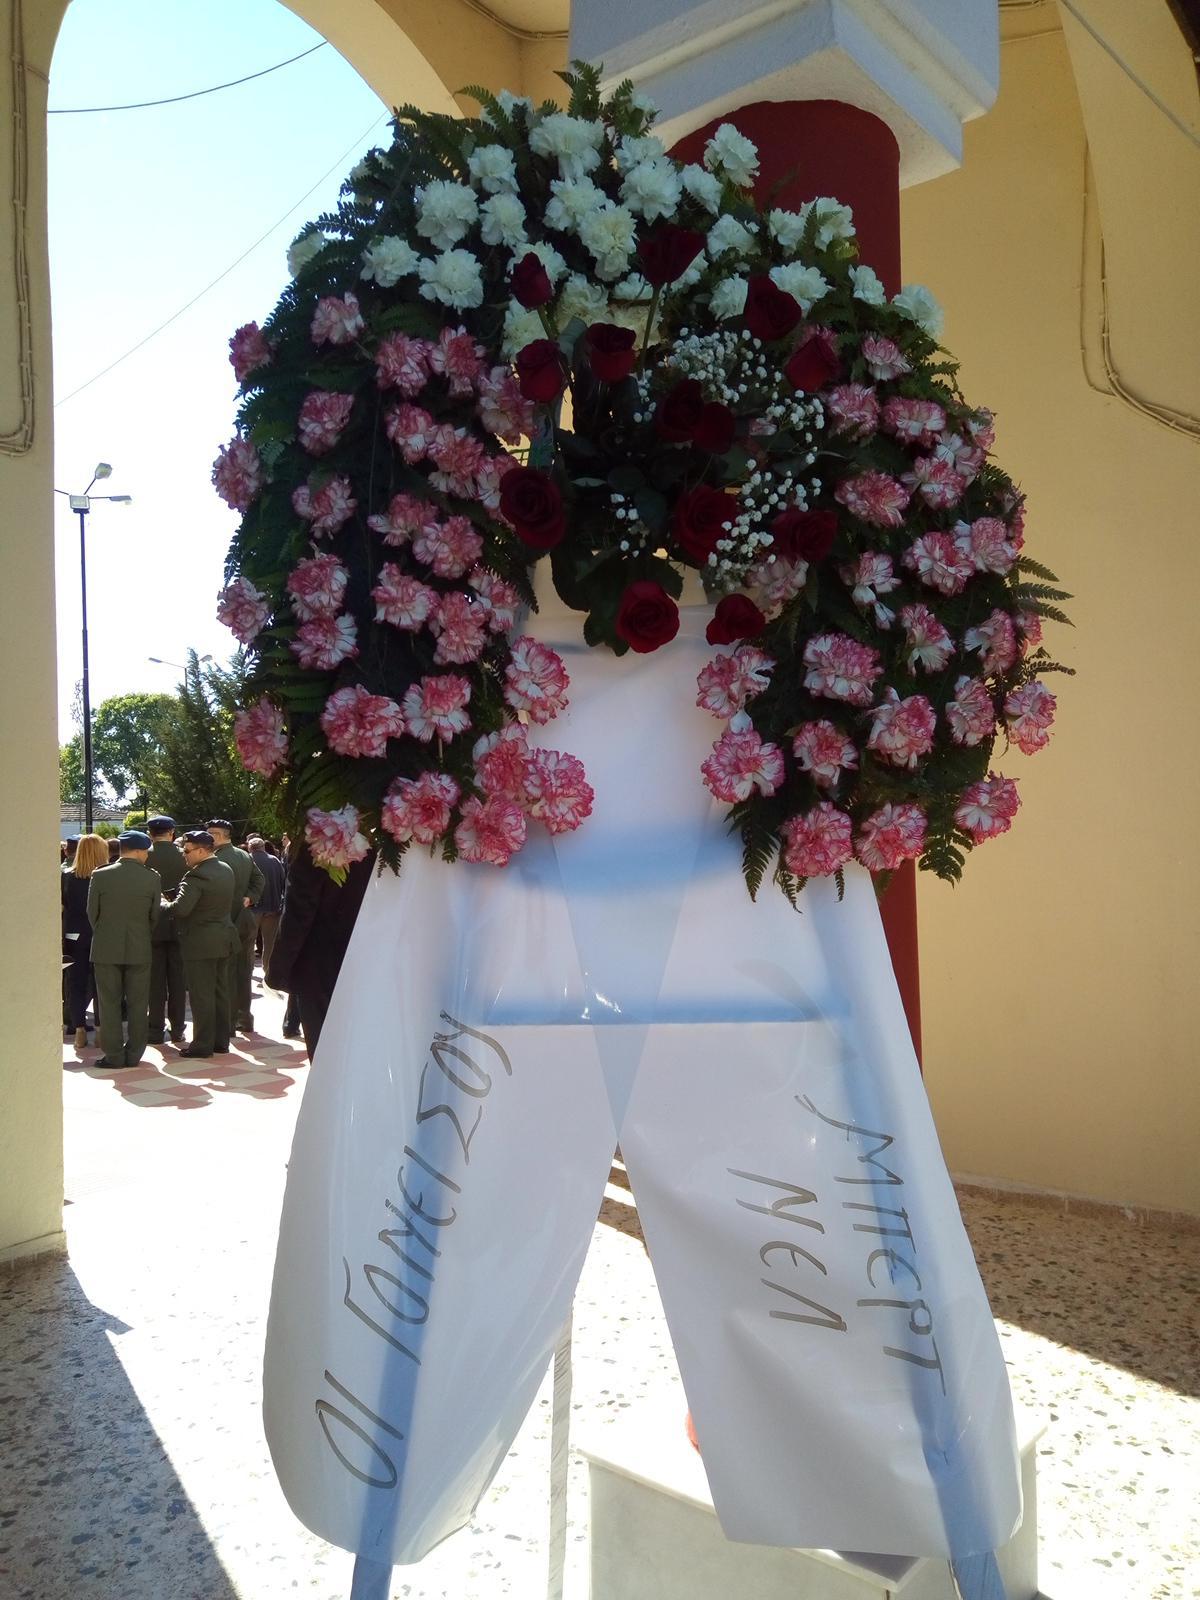 kidieia-paron-epta Σπαραγμός στις κηδείες των στελεχών των Ενόπλων Δυνάμεων που σκοτώθηκαν με το μοιραίο Χιούι